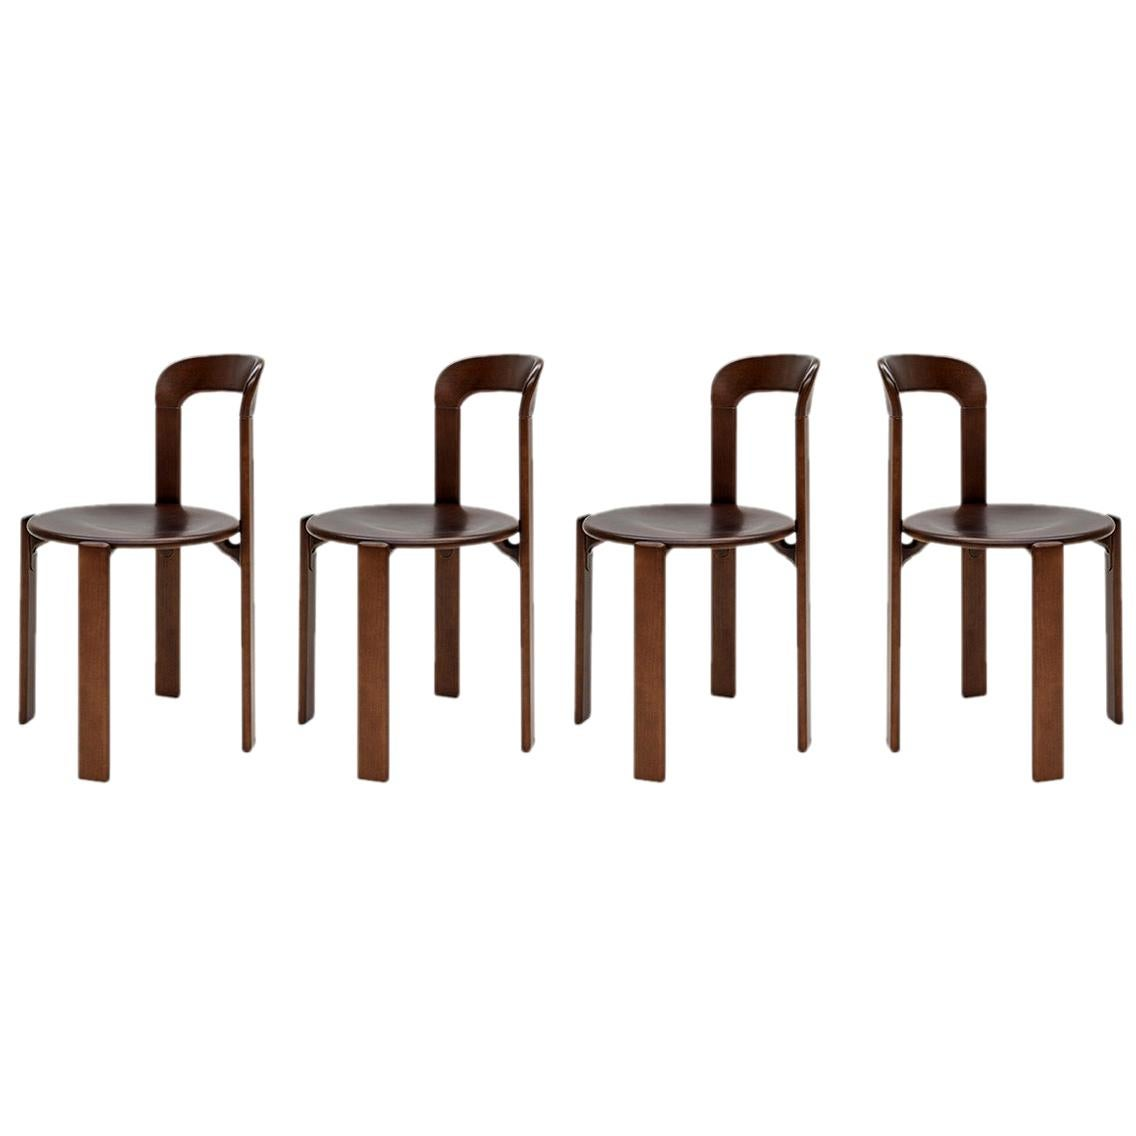 Mid-Century Modern, 4 Rey Chairs by Bruno Rey, Color Vintage Walnut, Design 1971